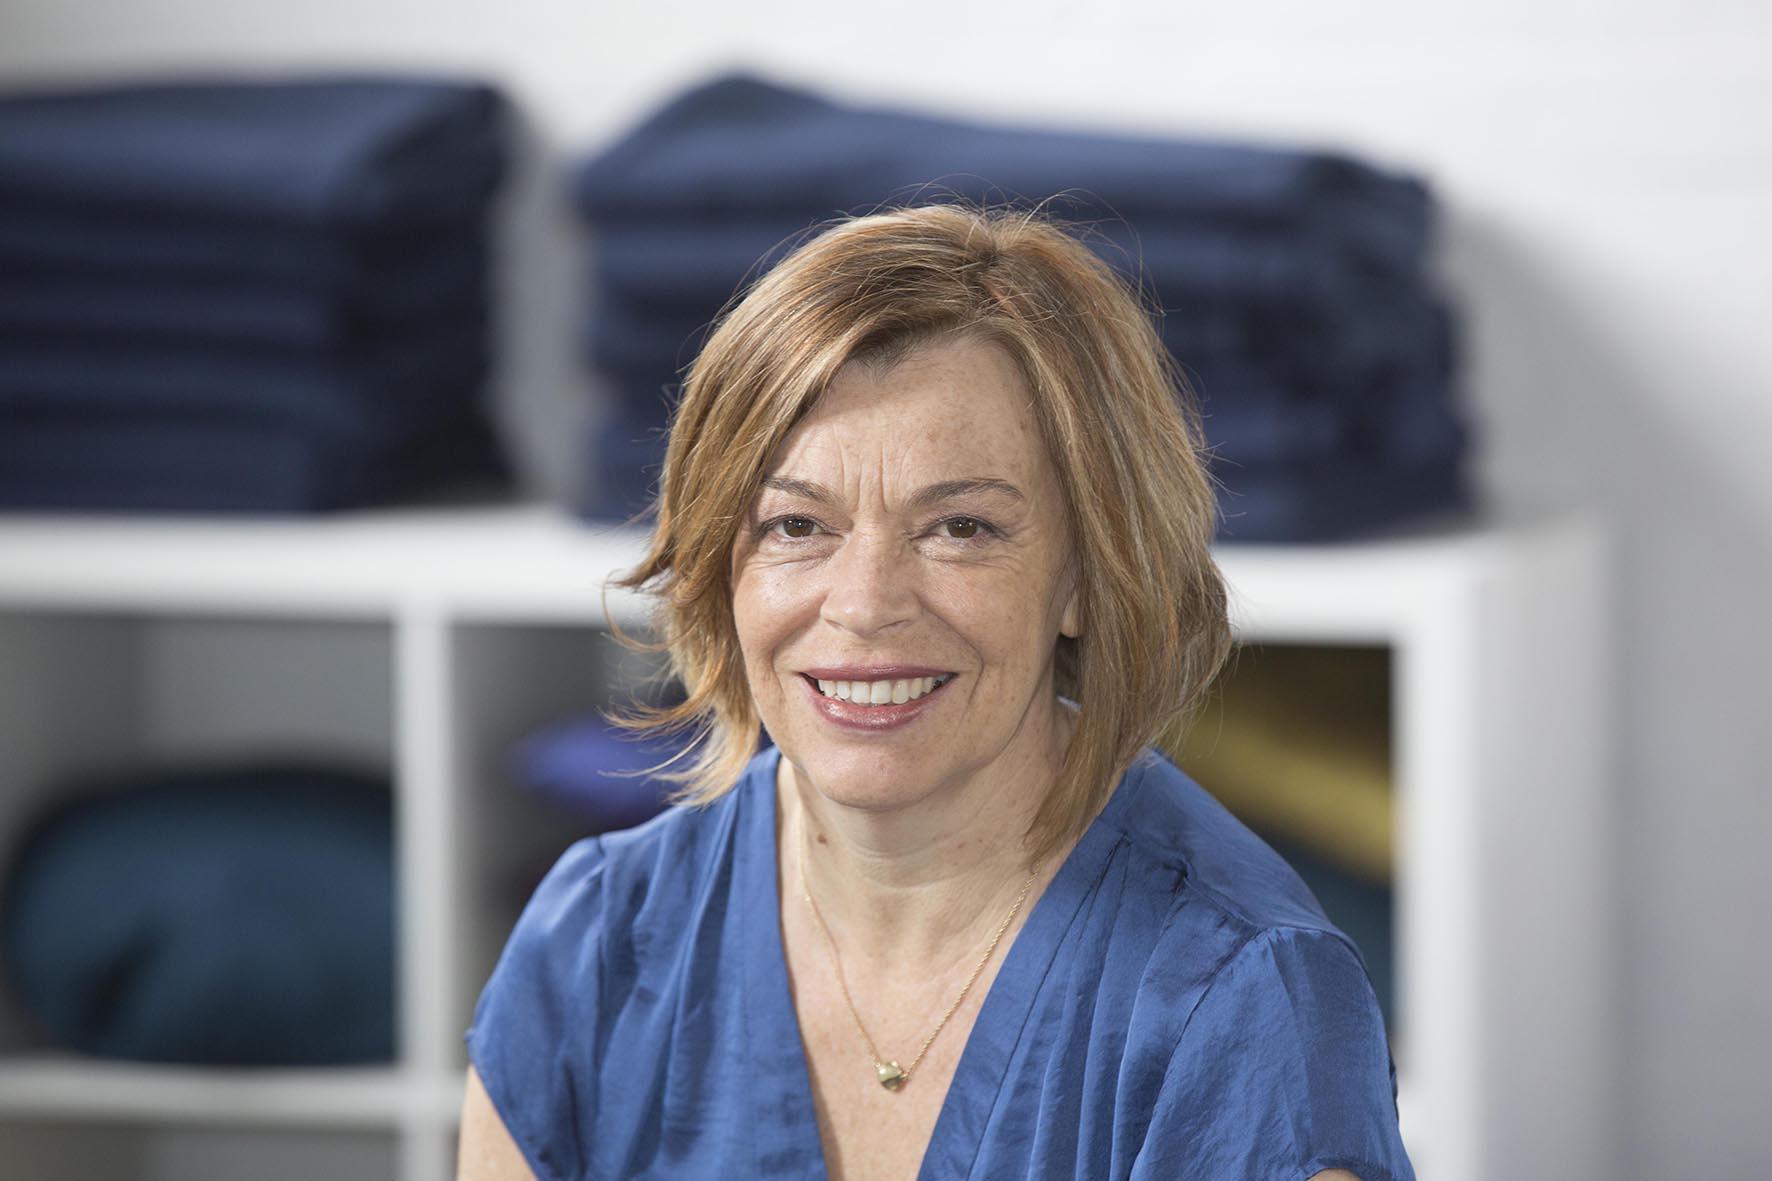 Suzanne Peyton